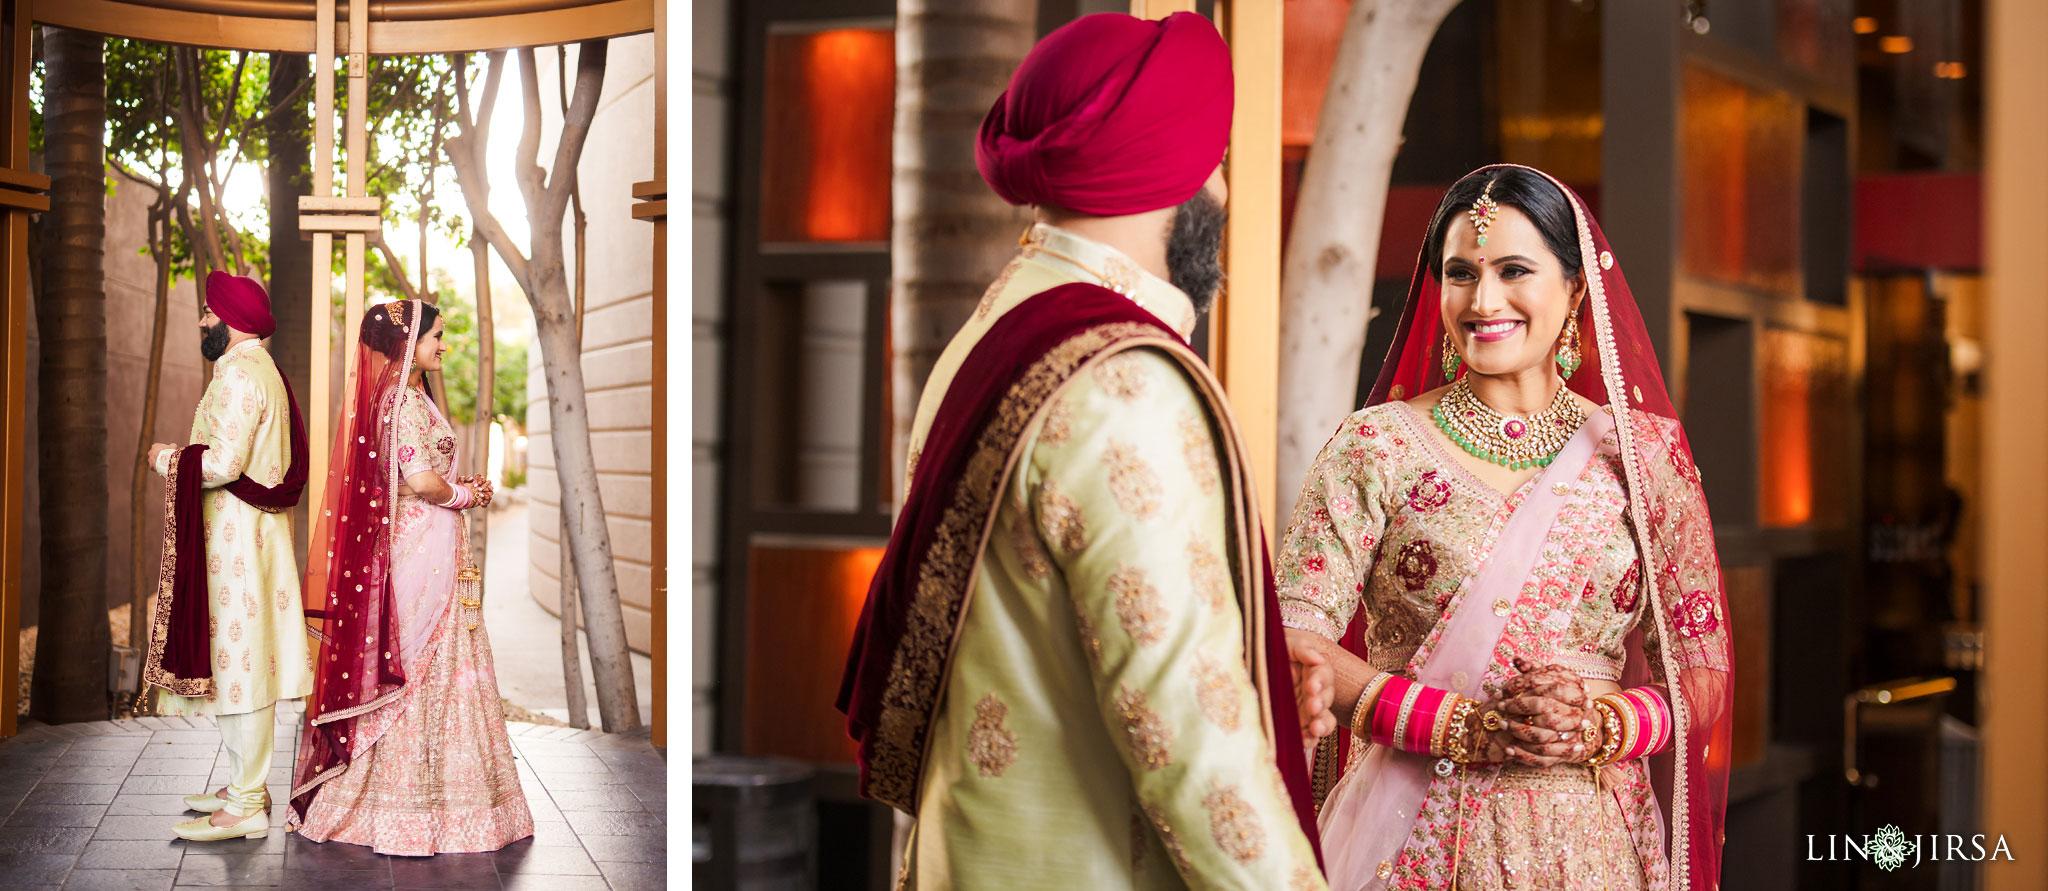 11 marina del rey marriott indian first look wedding photography